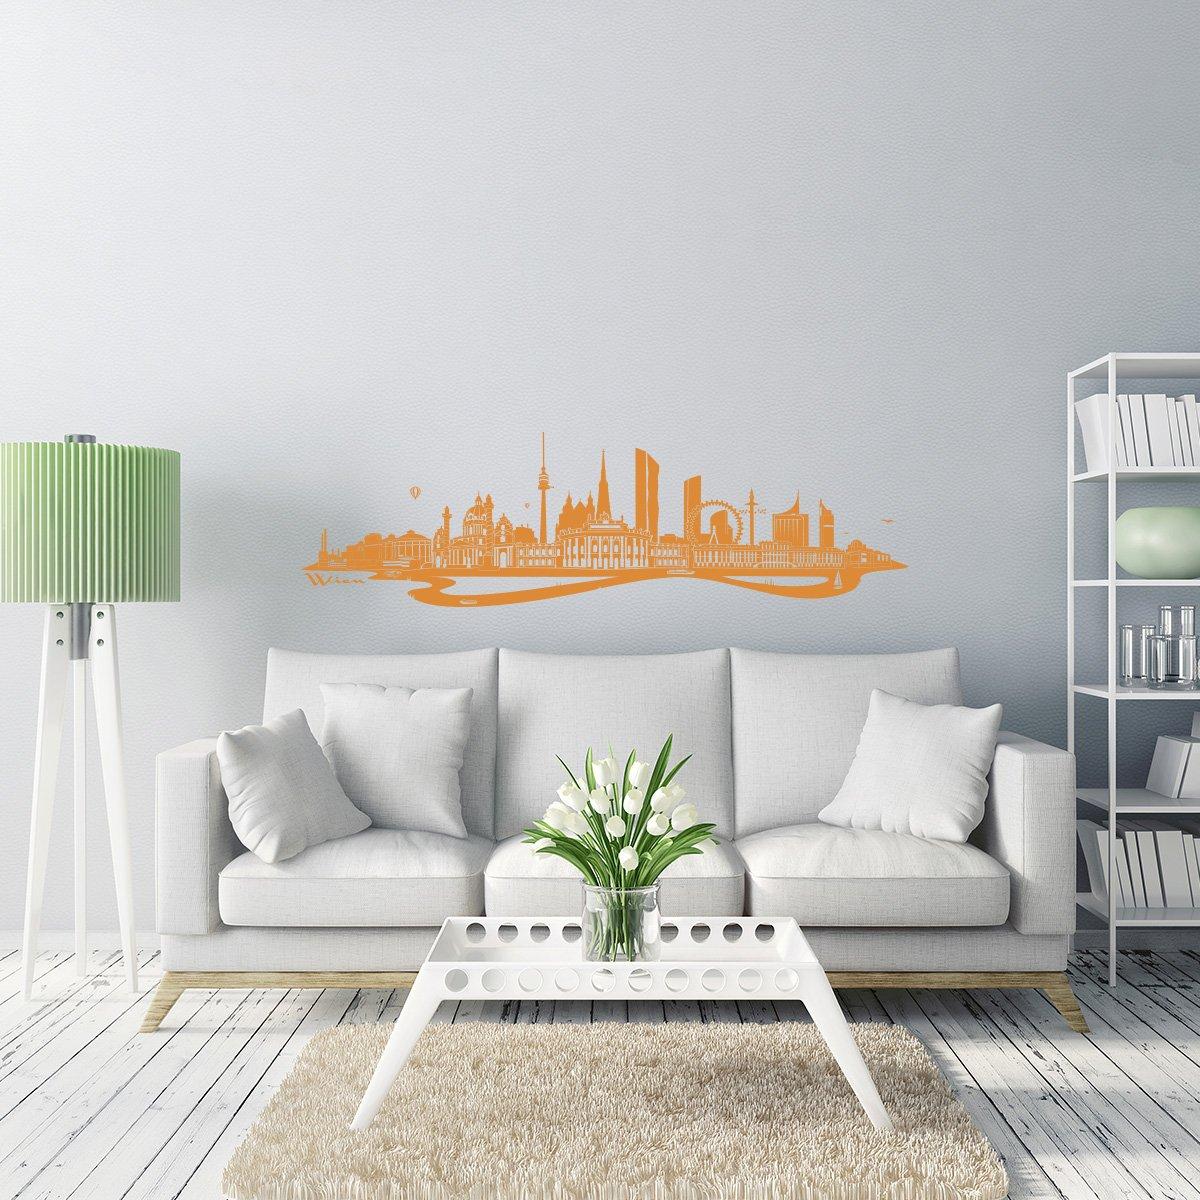 WANDKINGS Wandtattoo - Skyline Wien (mit Fluss) - 300 300 300 x 86 cm - Mittelgrau - Wähle aus 6 Größen & 35 Farben B078SF1HFB Wandtattoos & Wandbilder e9d0f0